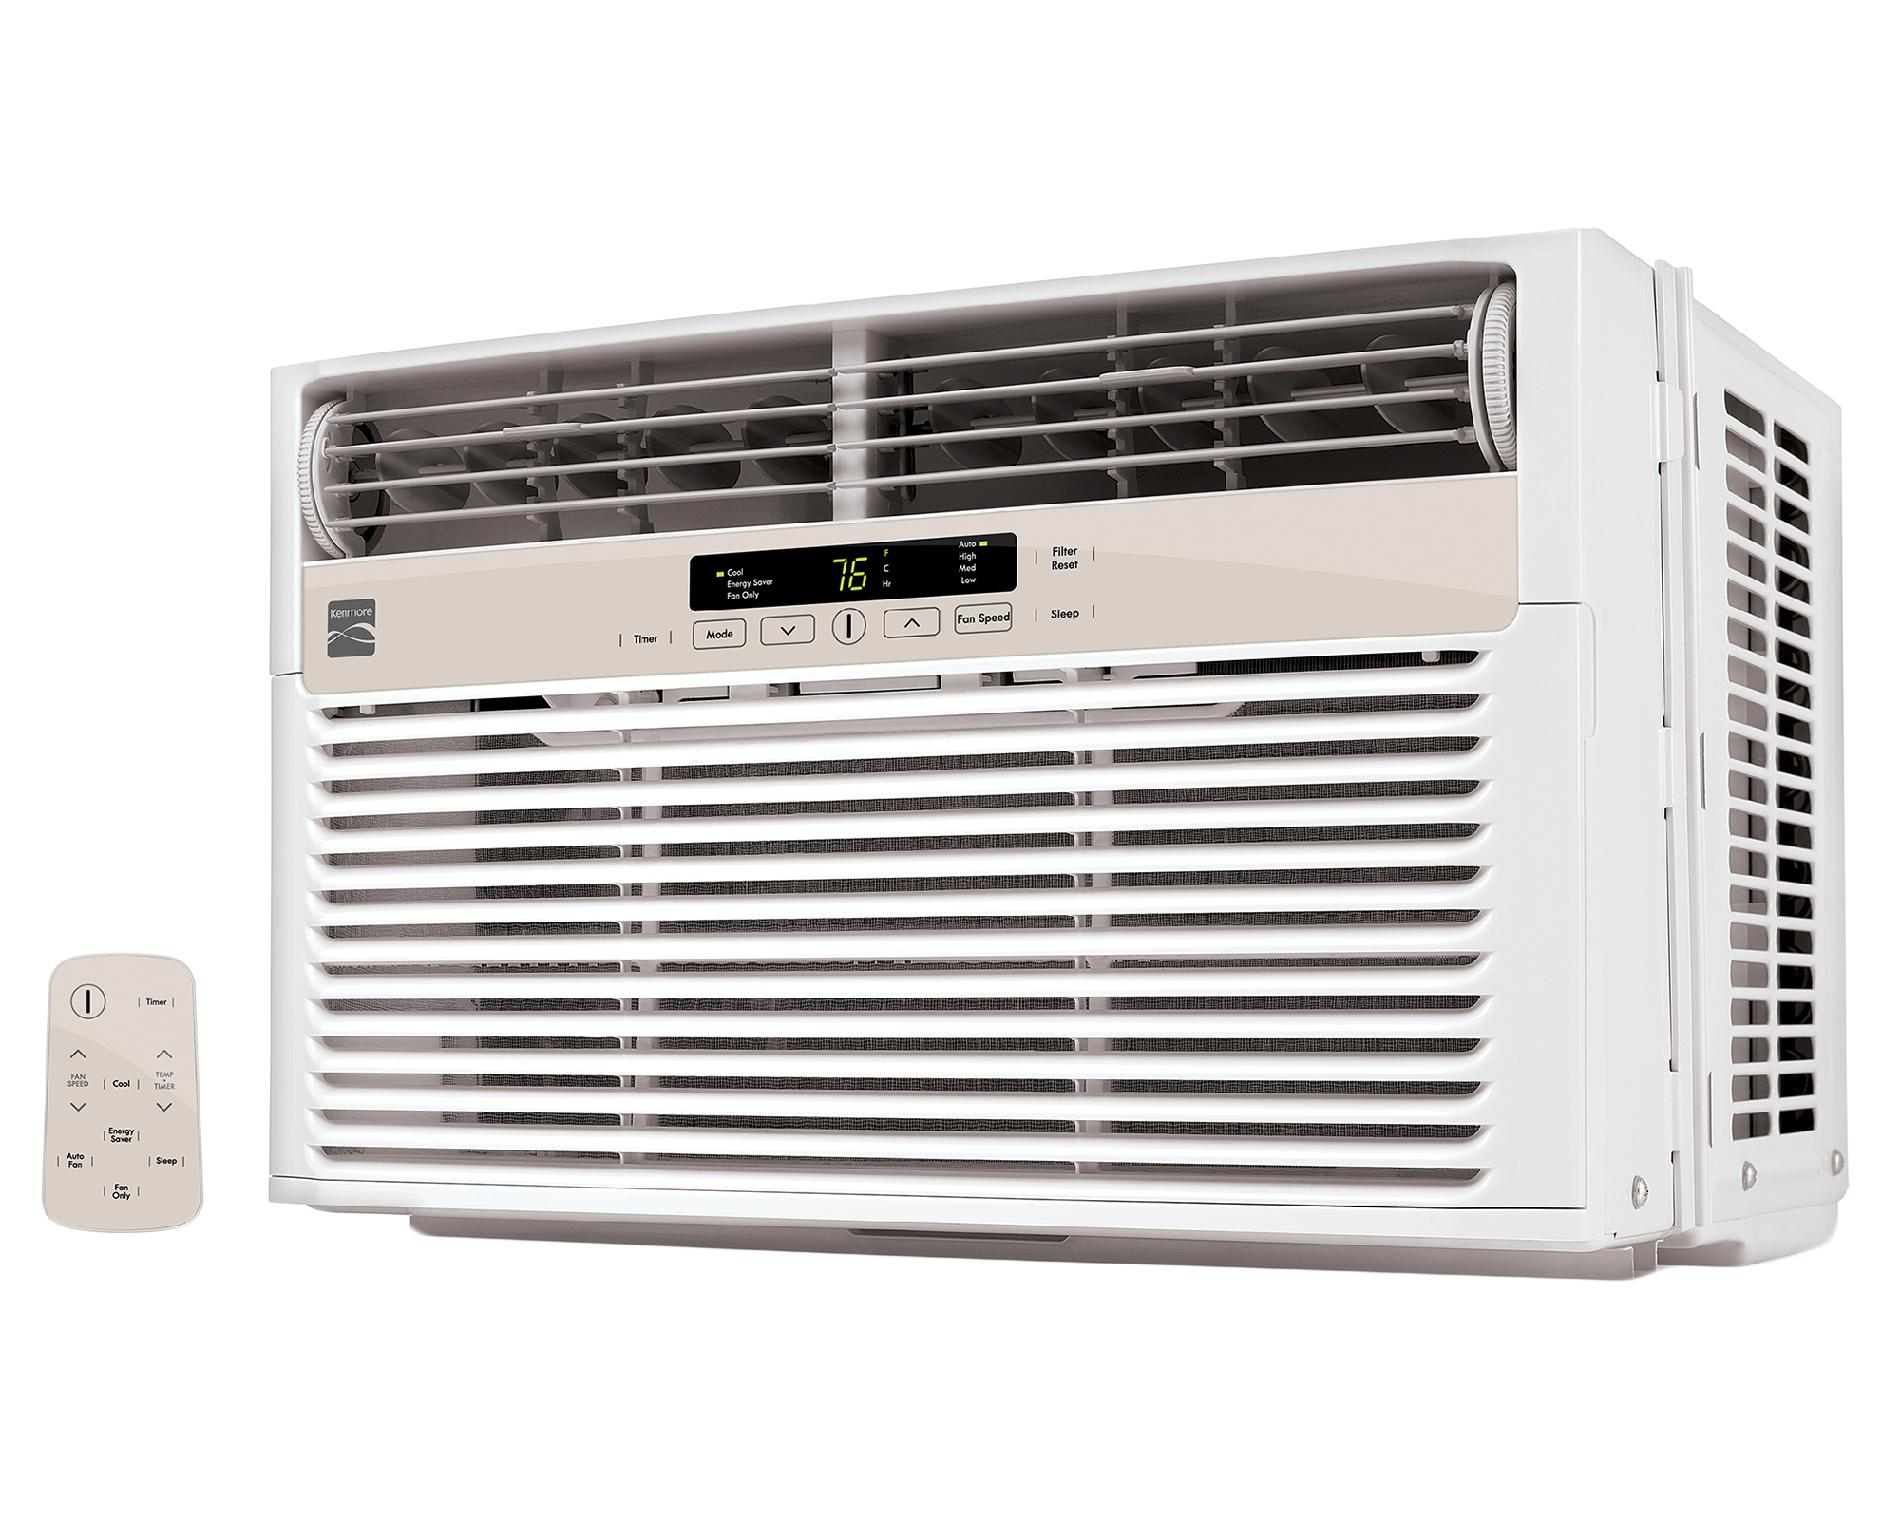 Kenmore 6,000-BTU Room Air Conditioner Window Unit - White